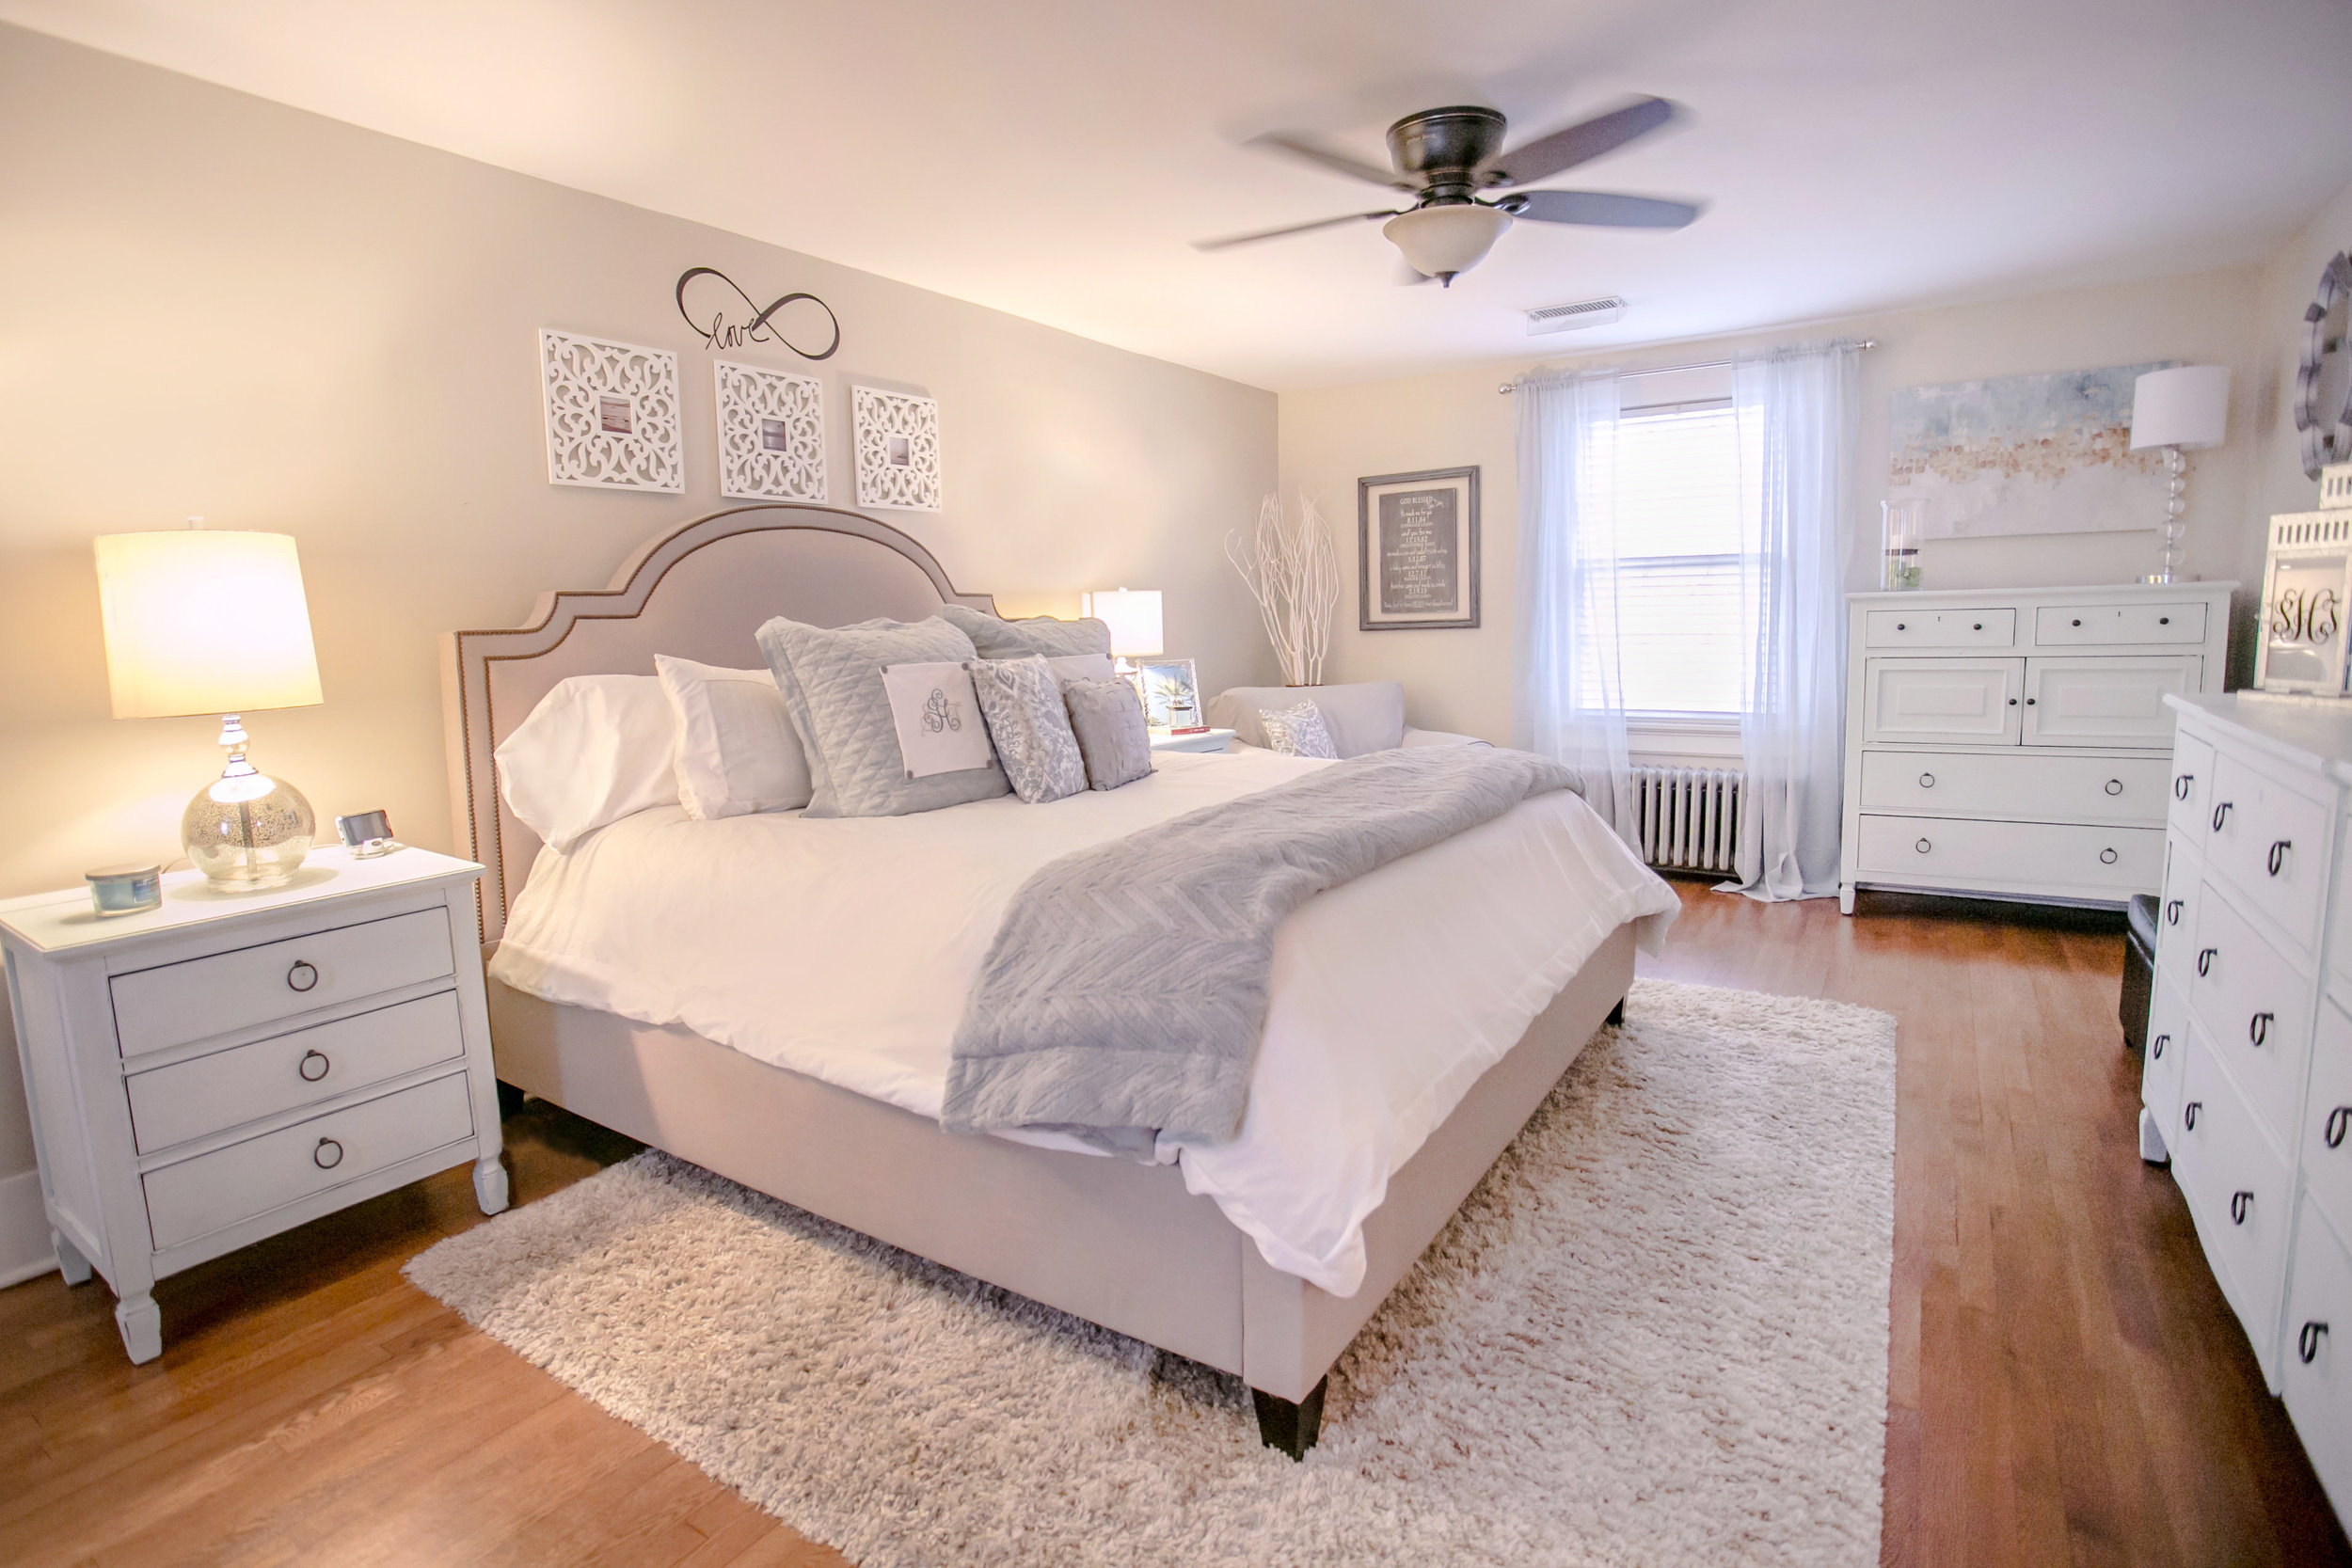 Bedroom3-After.jpg